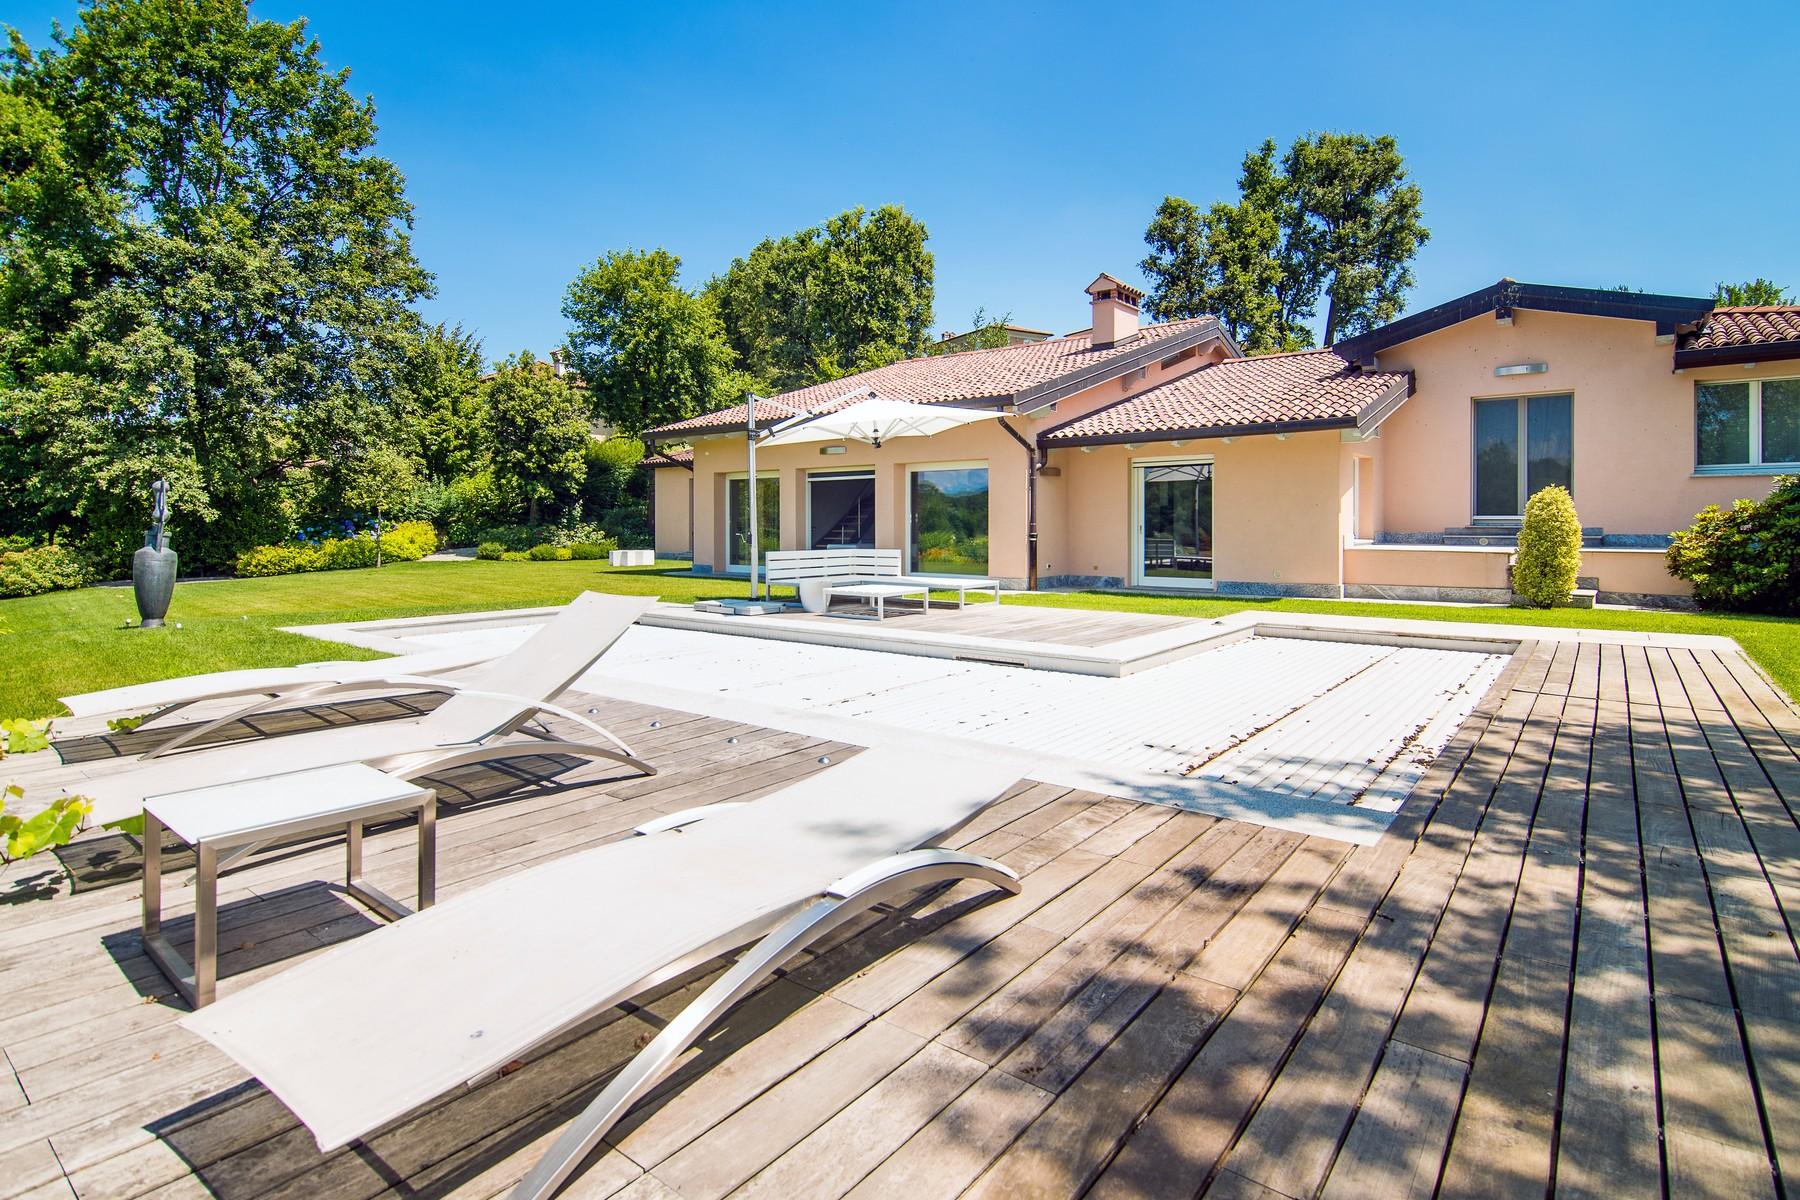 Villa in Vendita a Bogogno via san isidoro